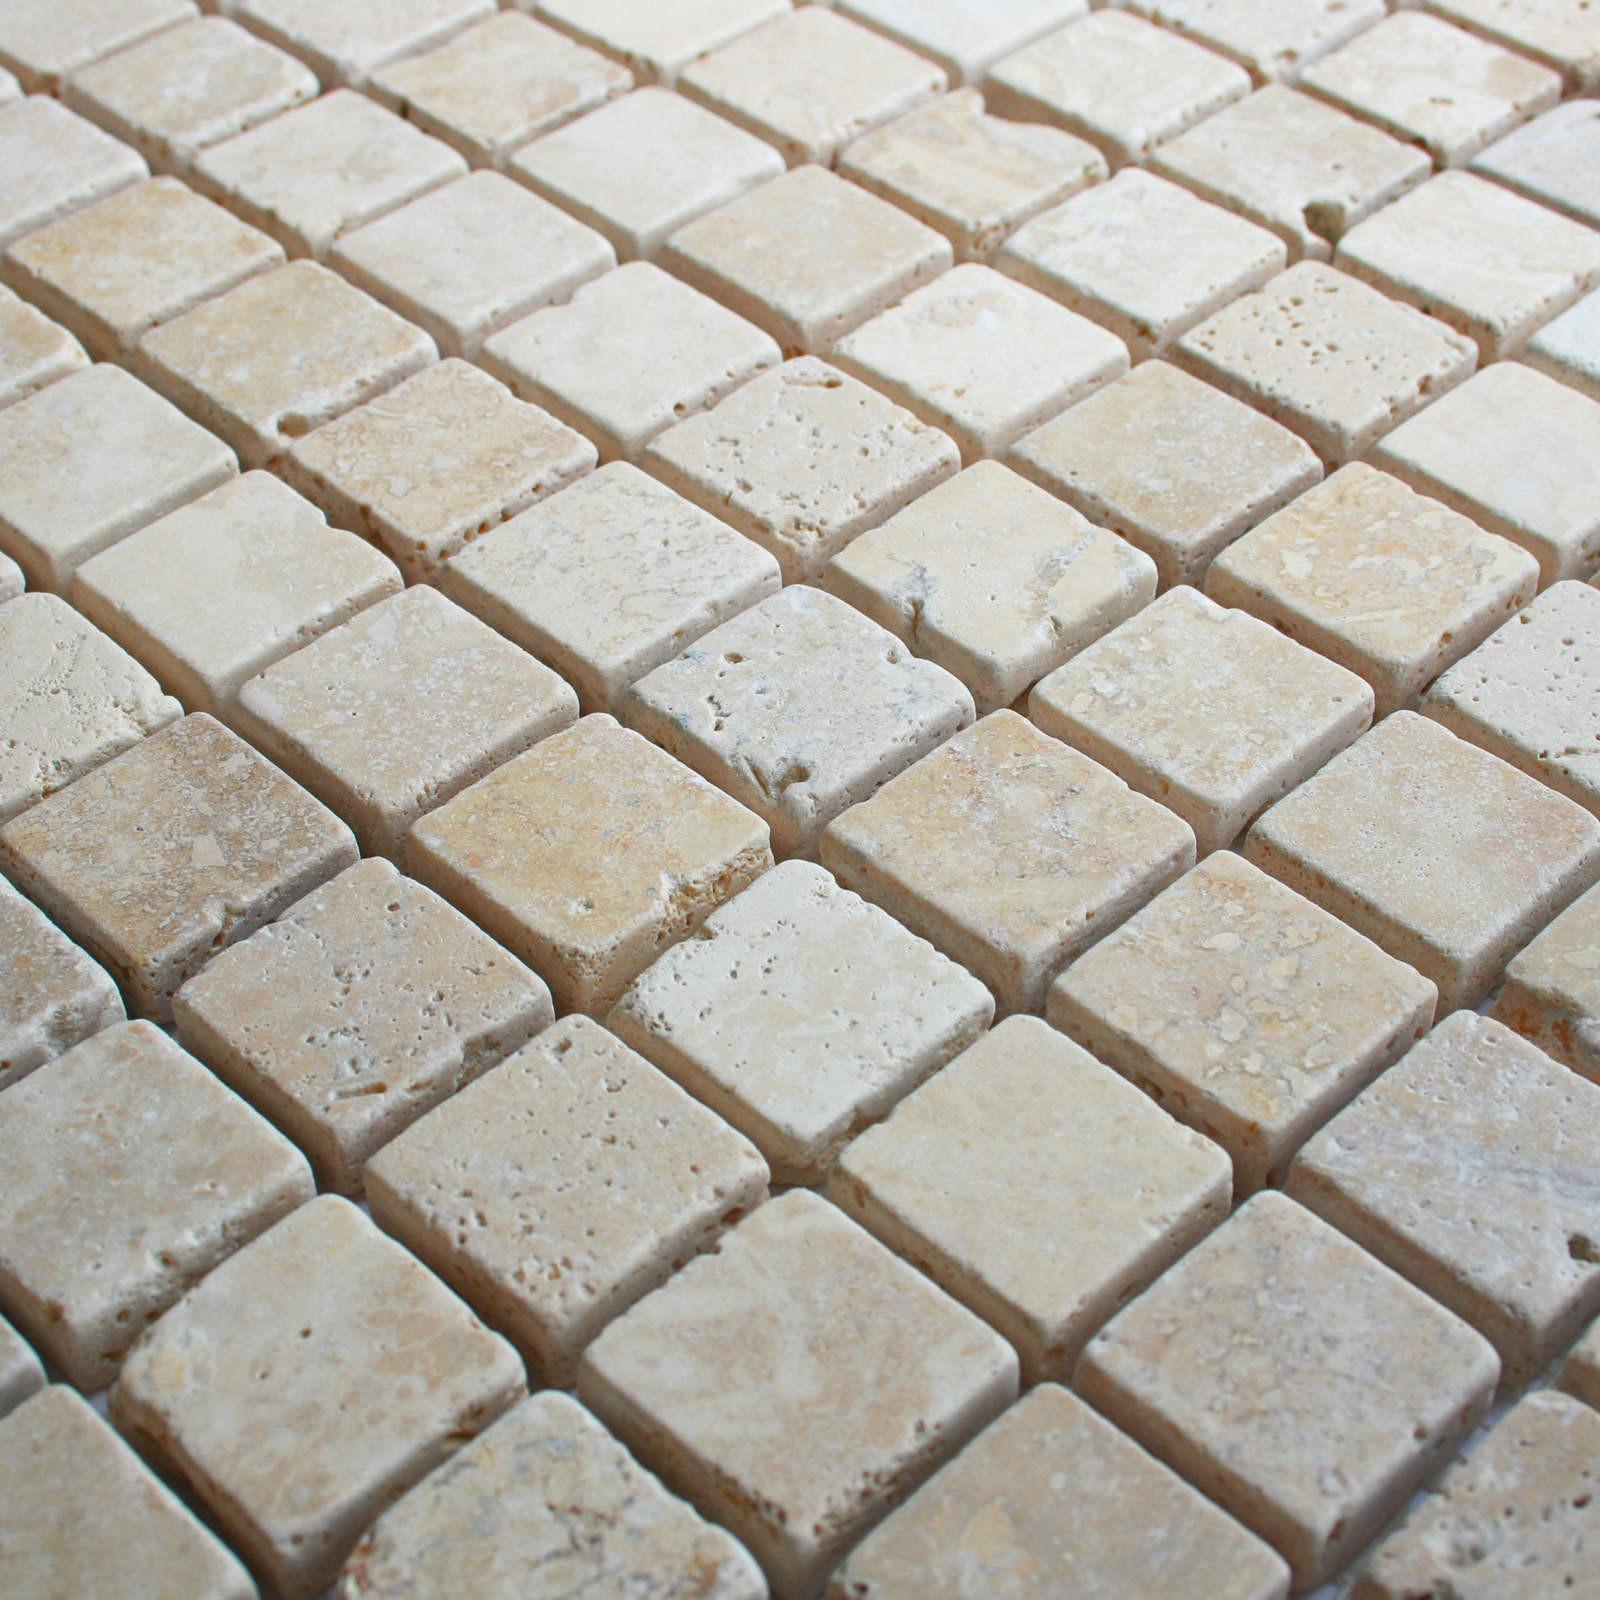 White Travertine Tumbled Wall Floor Mosaic Tile